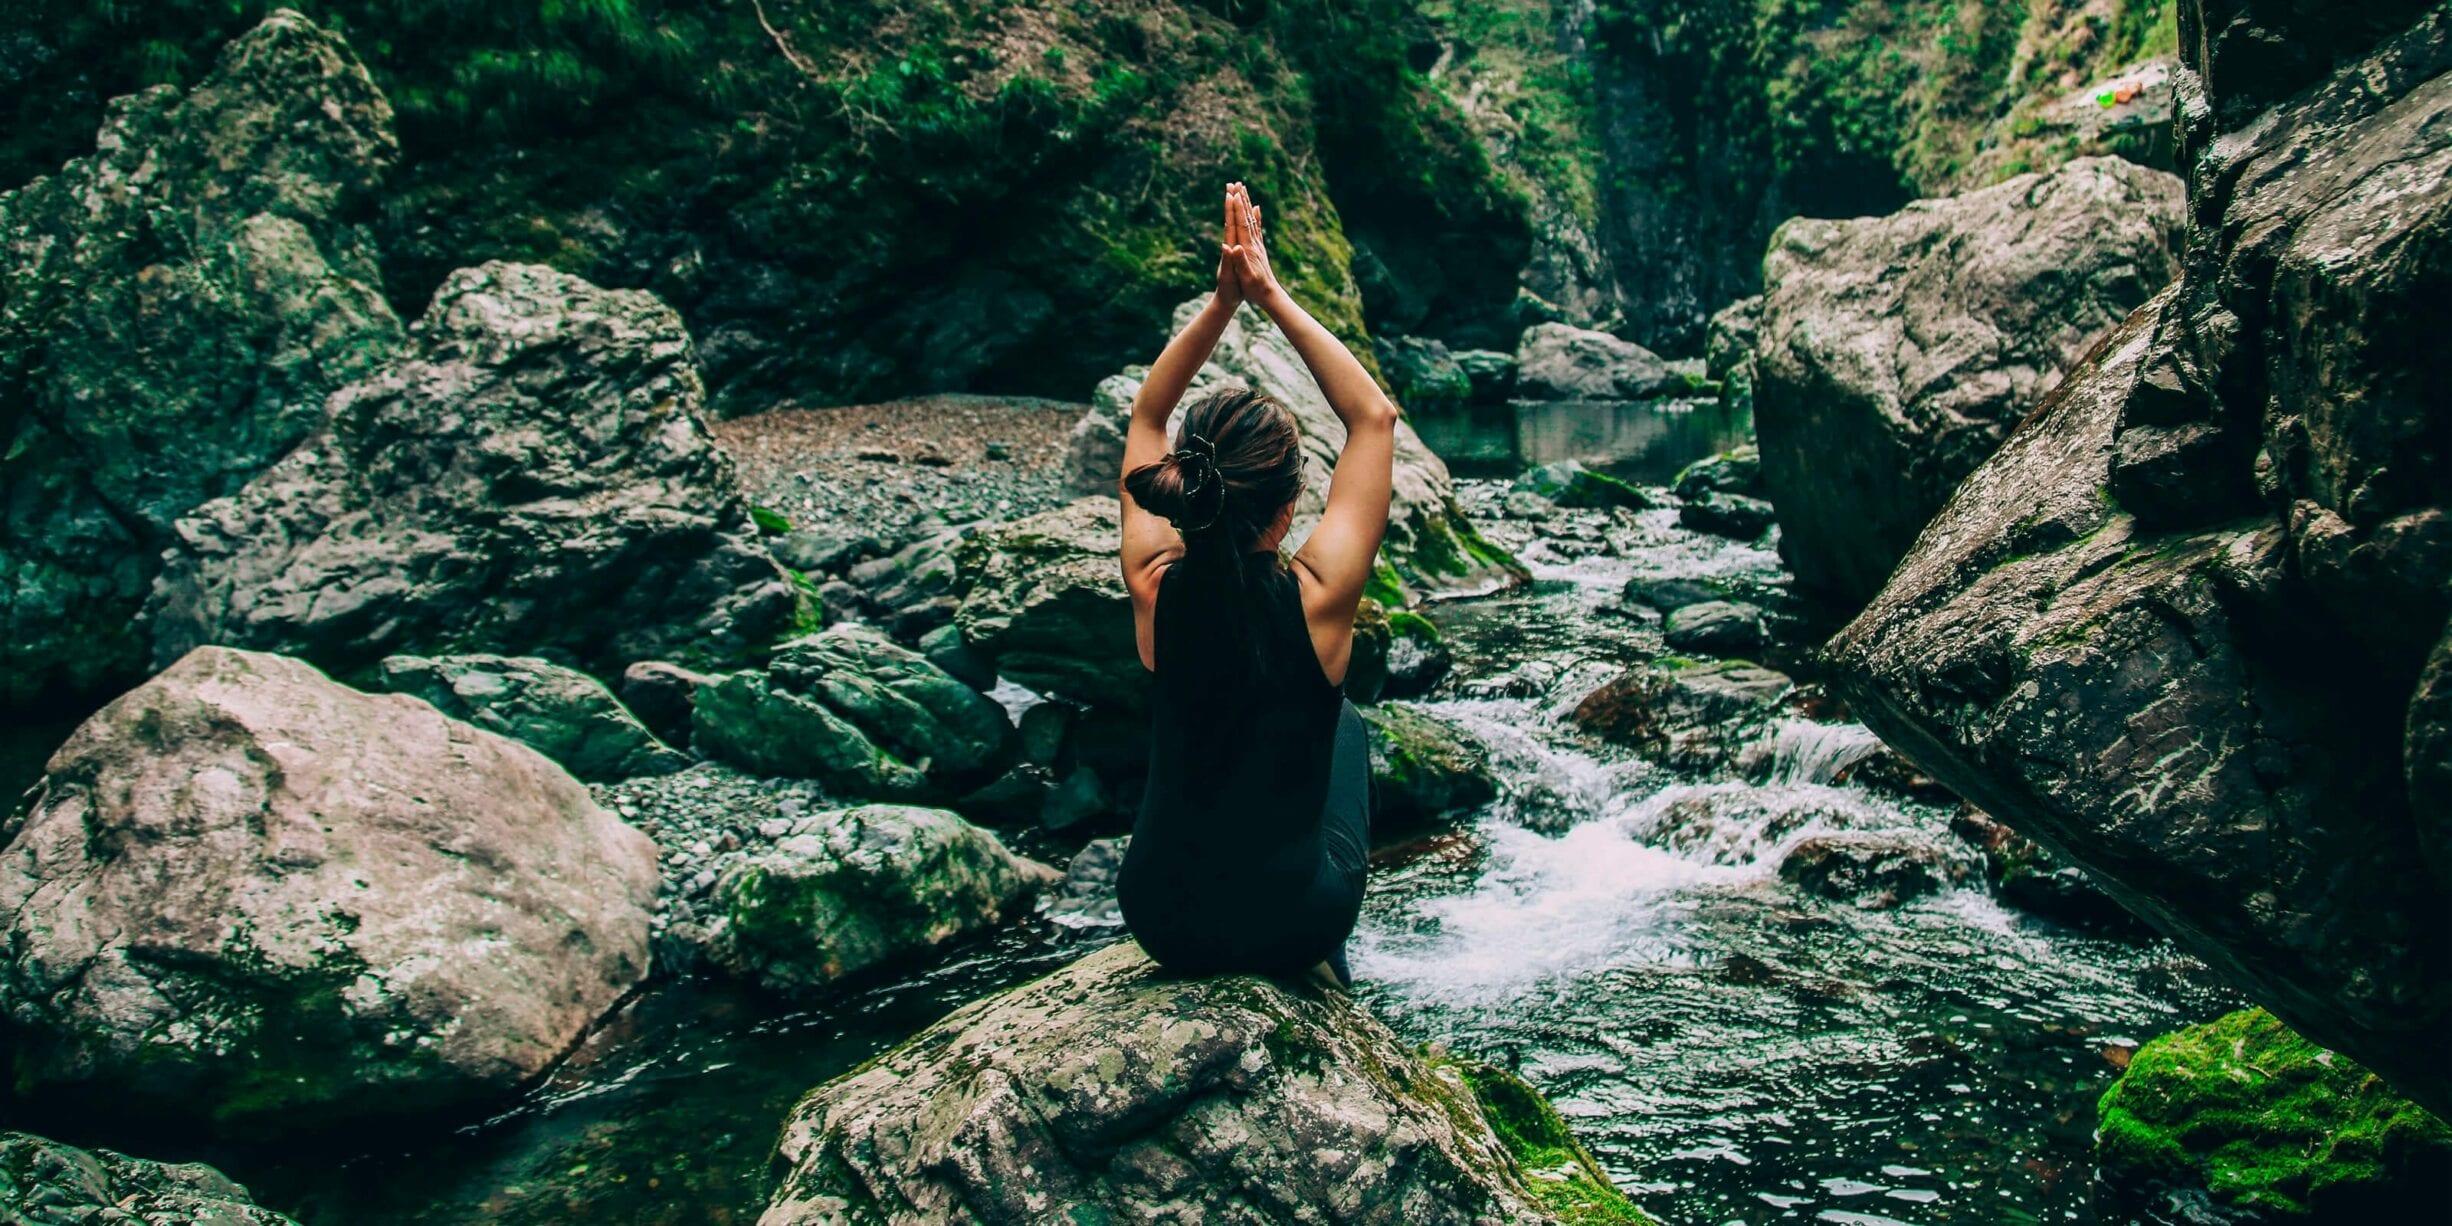 woman meditating sitting on river rocks